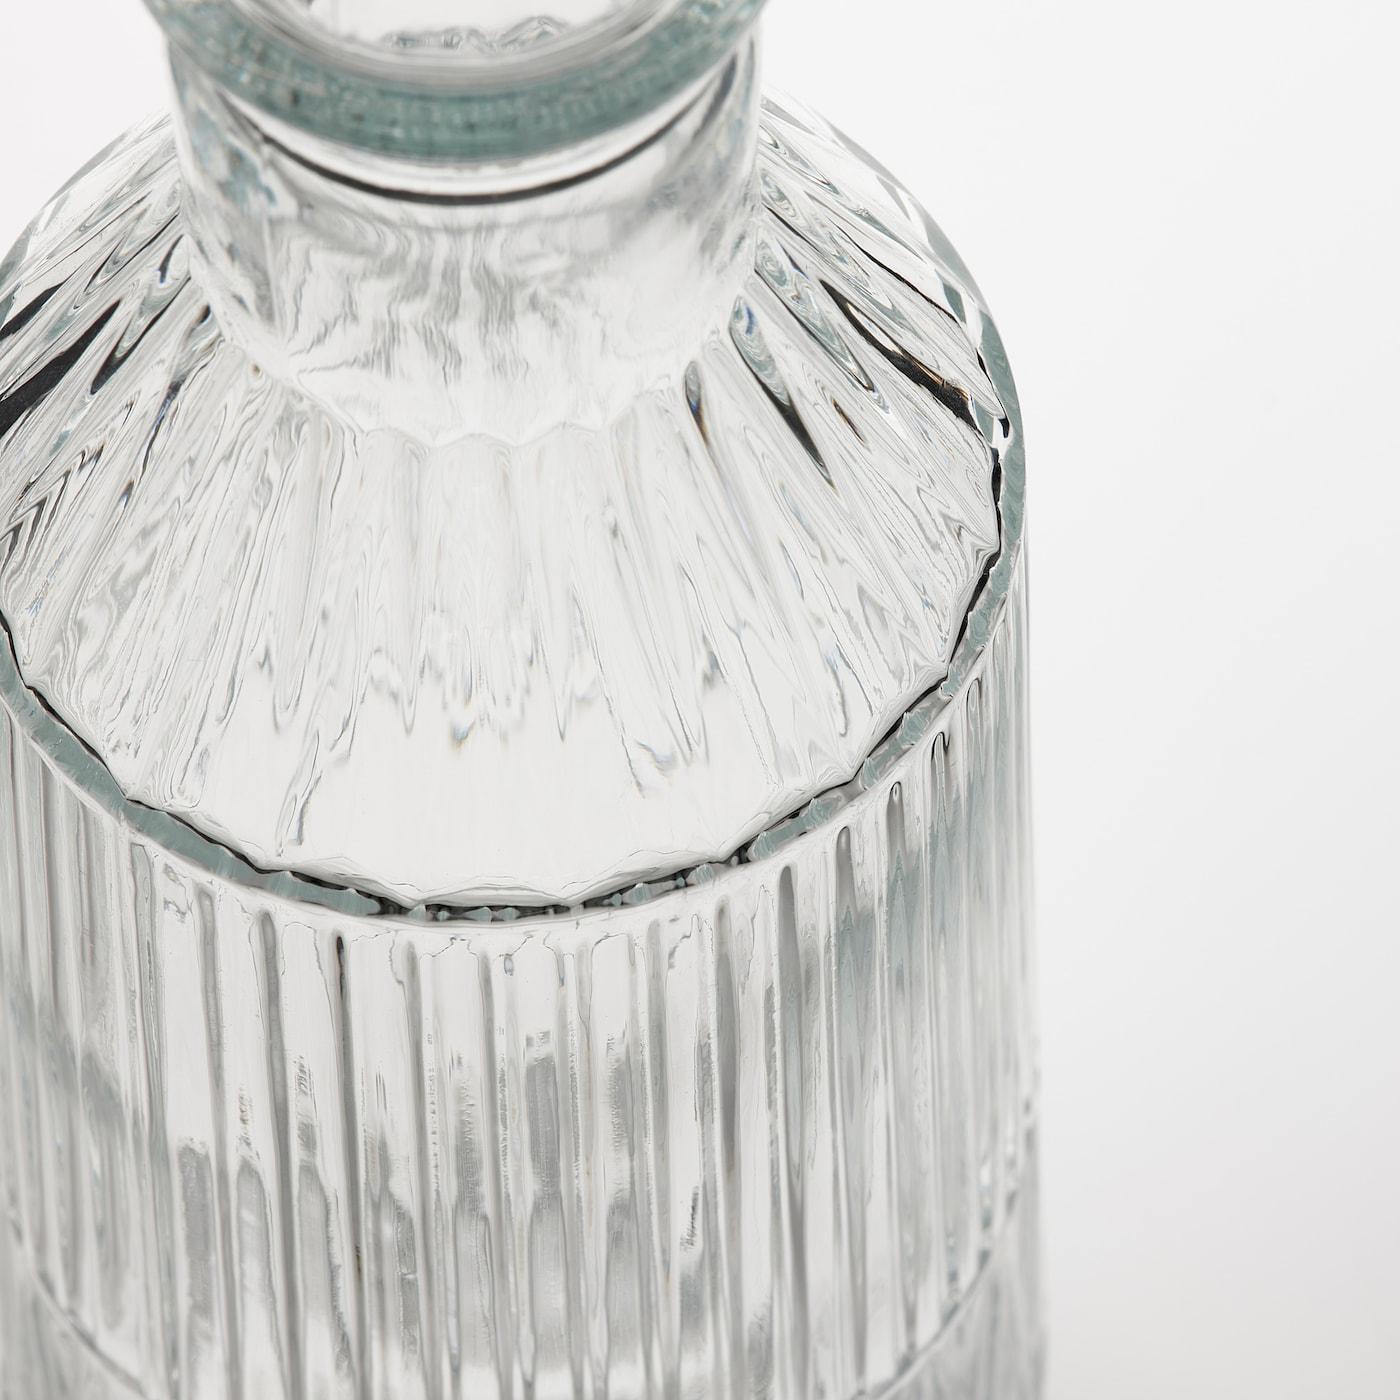 SÄLLSKAPLIG Carafe with stopper, clear glass/patterned, 1 l